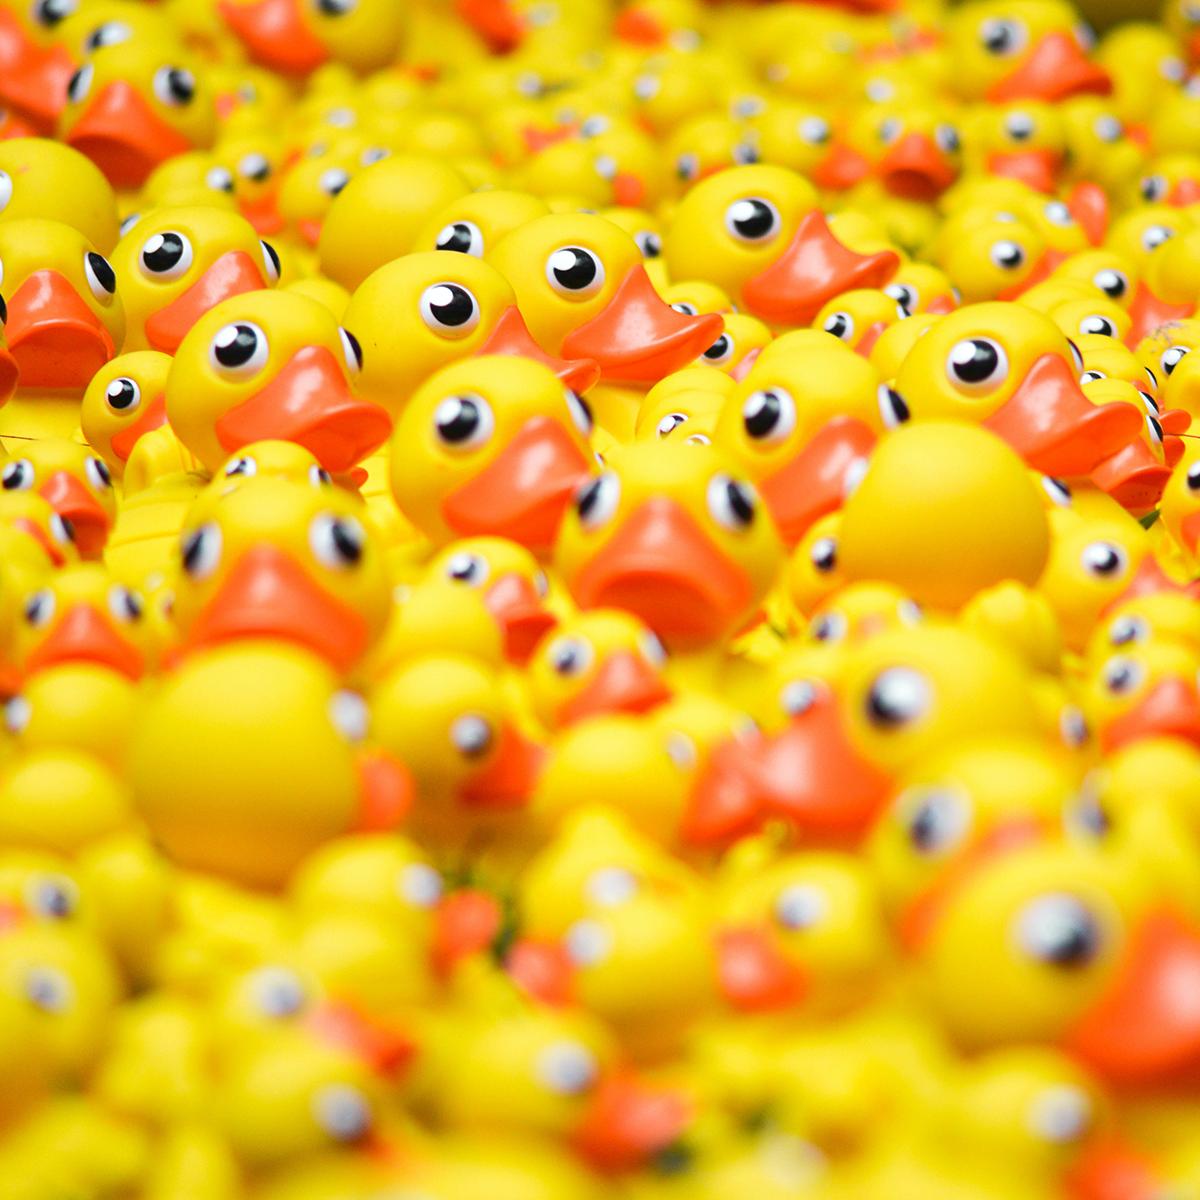 Canards en plastique